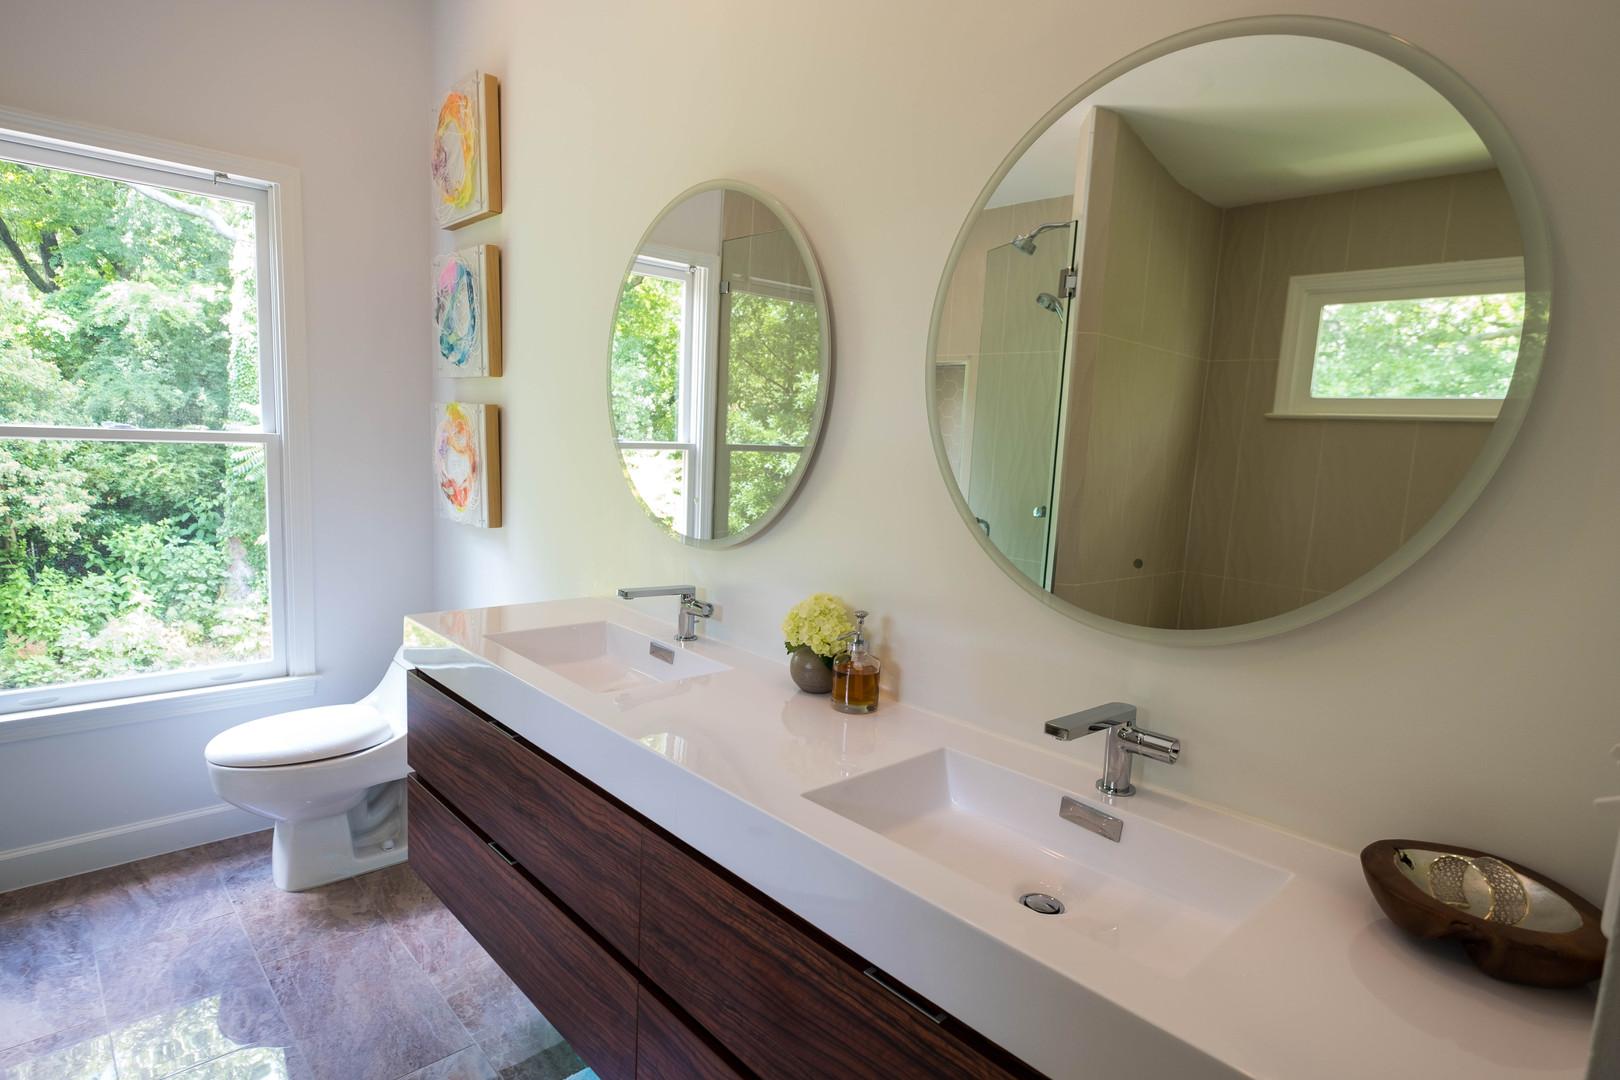 Bathroom4_Niki Zarrabi Continuous I-III and LED mirrors.jpg